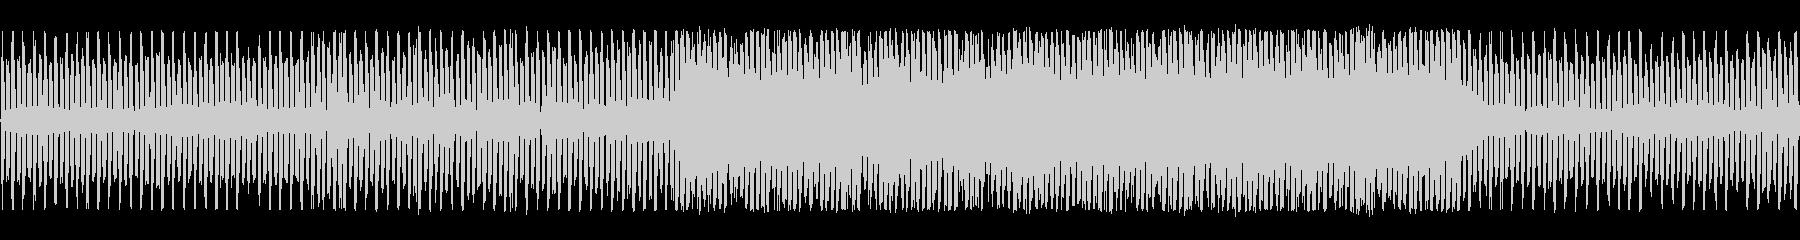 8-Bit_Action Aggressive10の未再生の波形